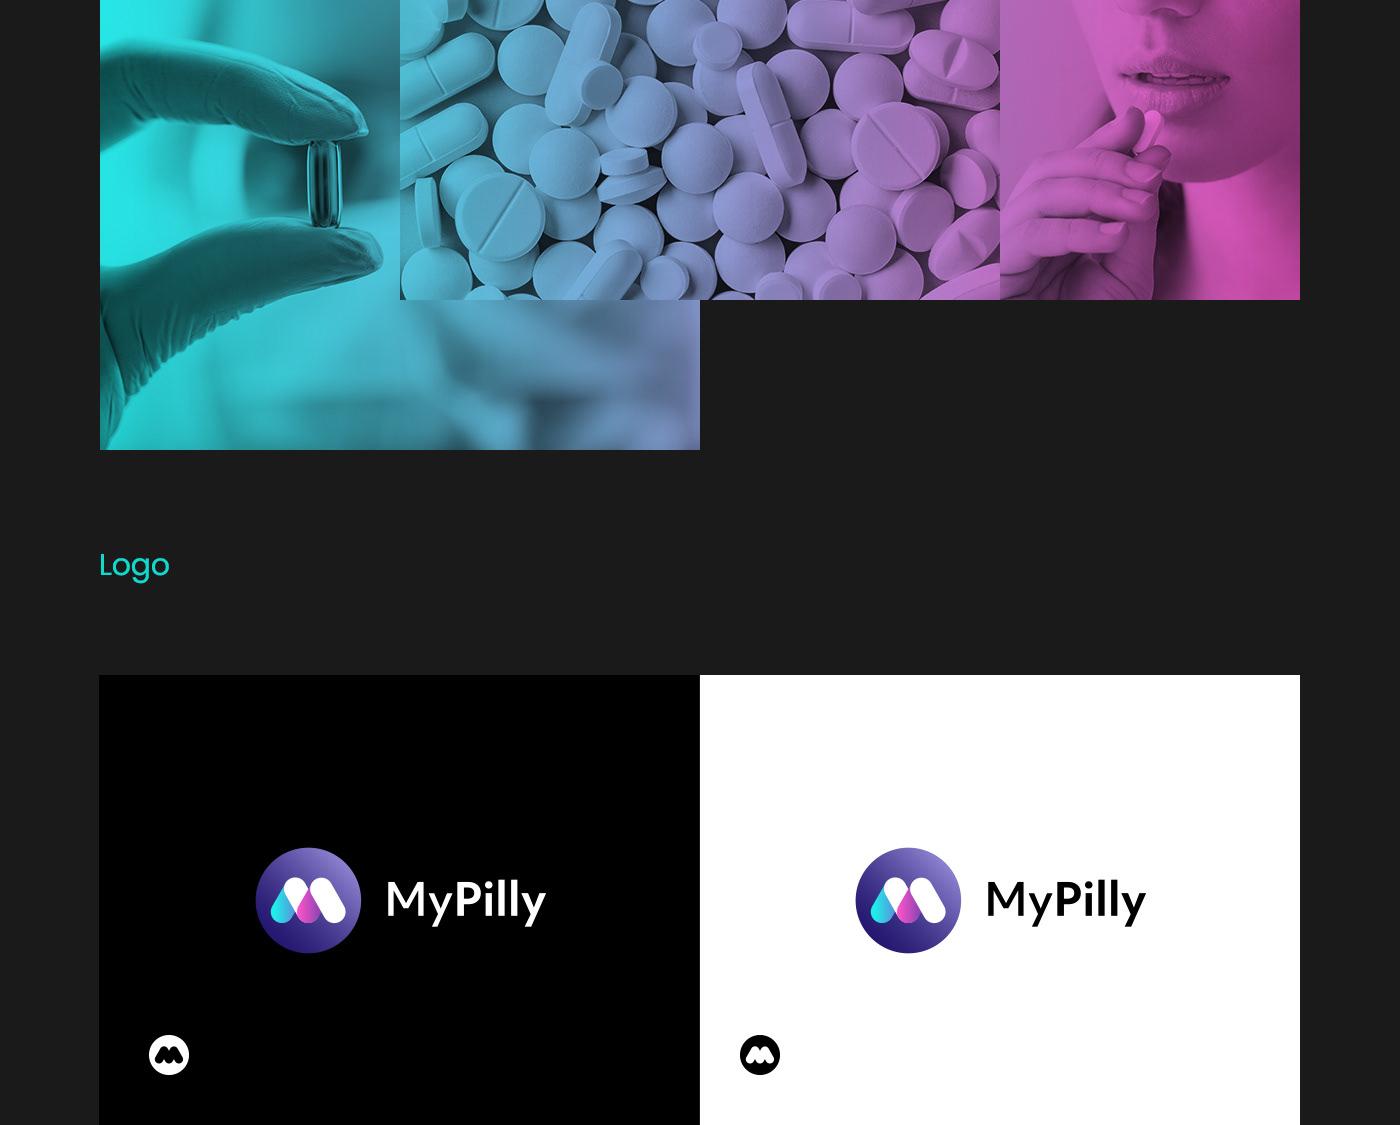 Pilly medicine logo branding  CI ID poland agency visiontrust app